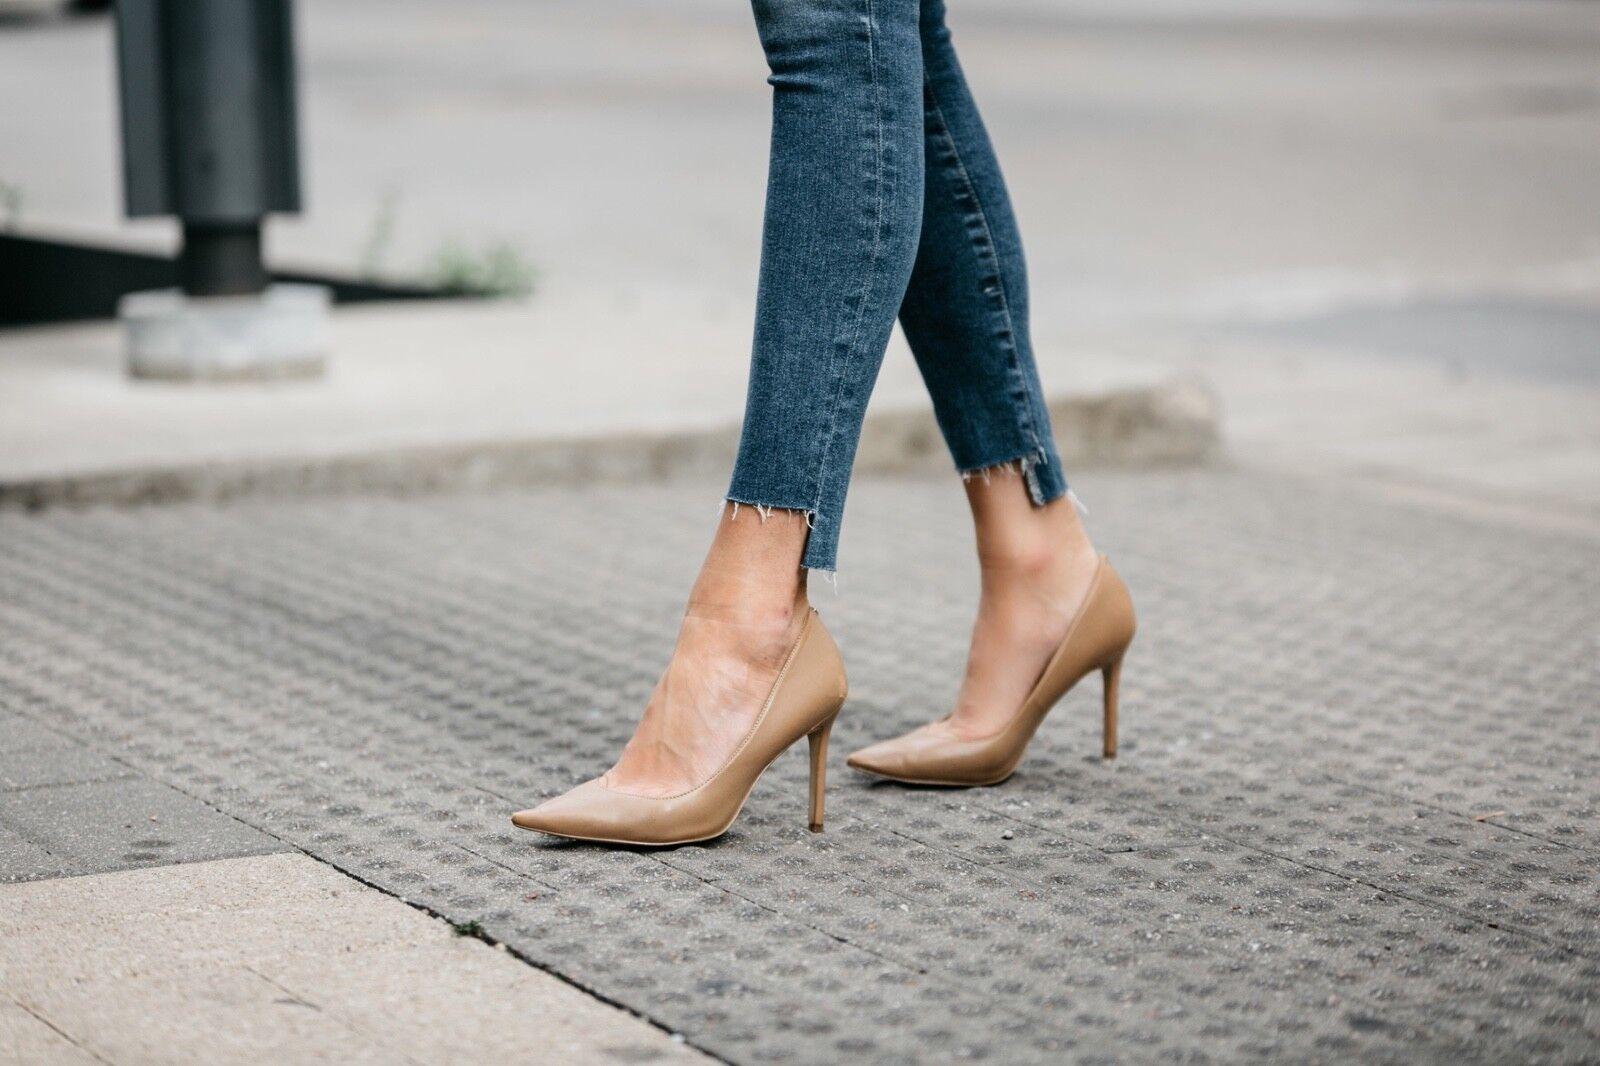 Sam Edelman Hazel nude  leather heels size 7.5  nude narrow new 79b5f1